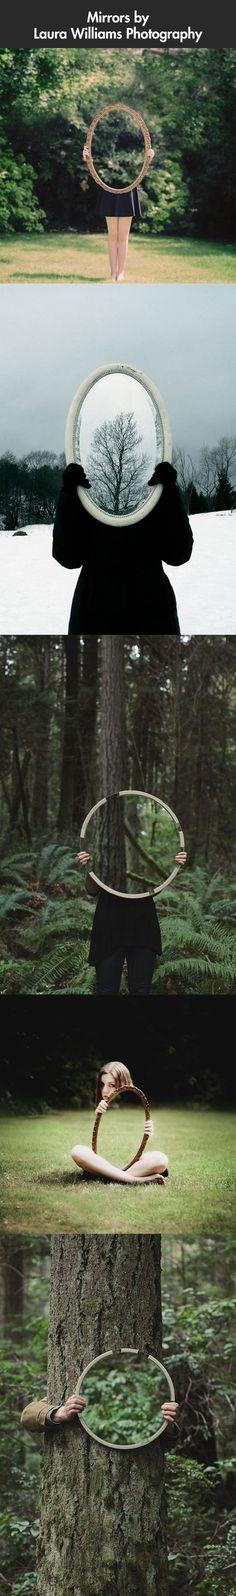 mirrors, photographi inspir, pictur, idea, mirror imag, art exam, random, beauti, awesom